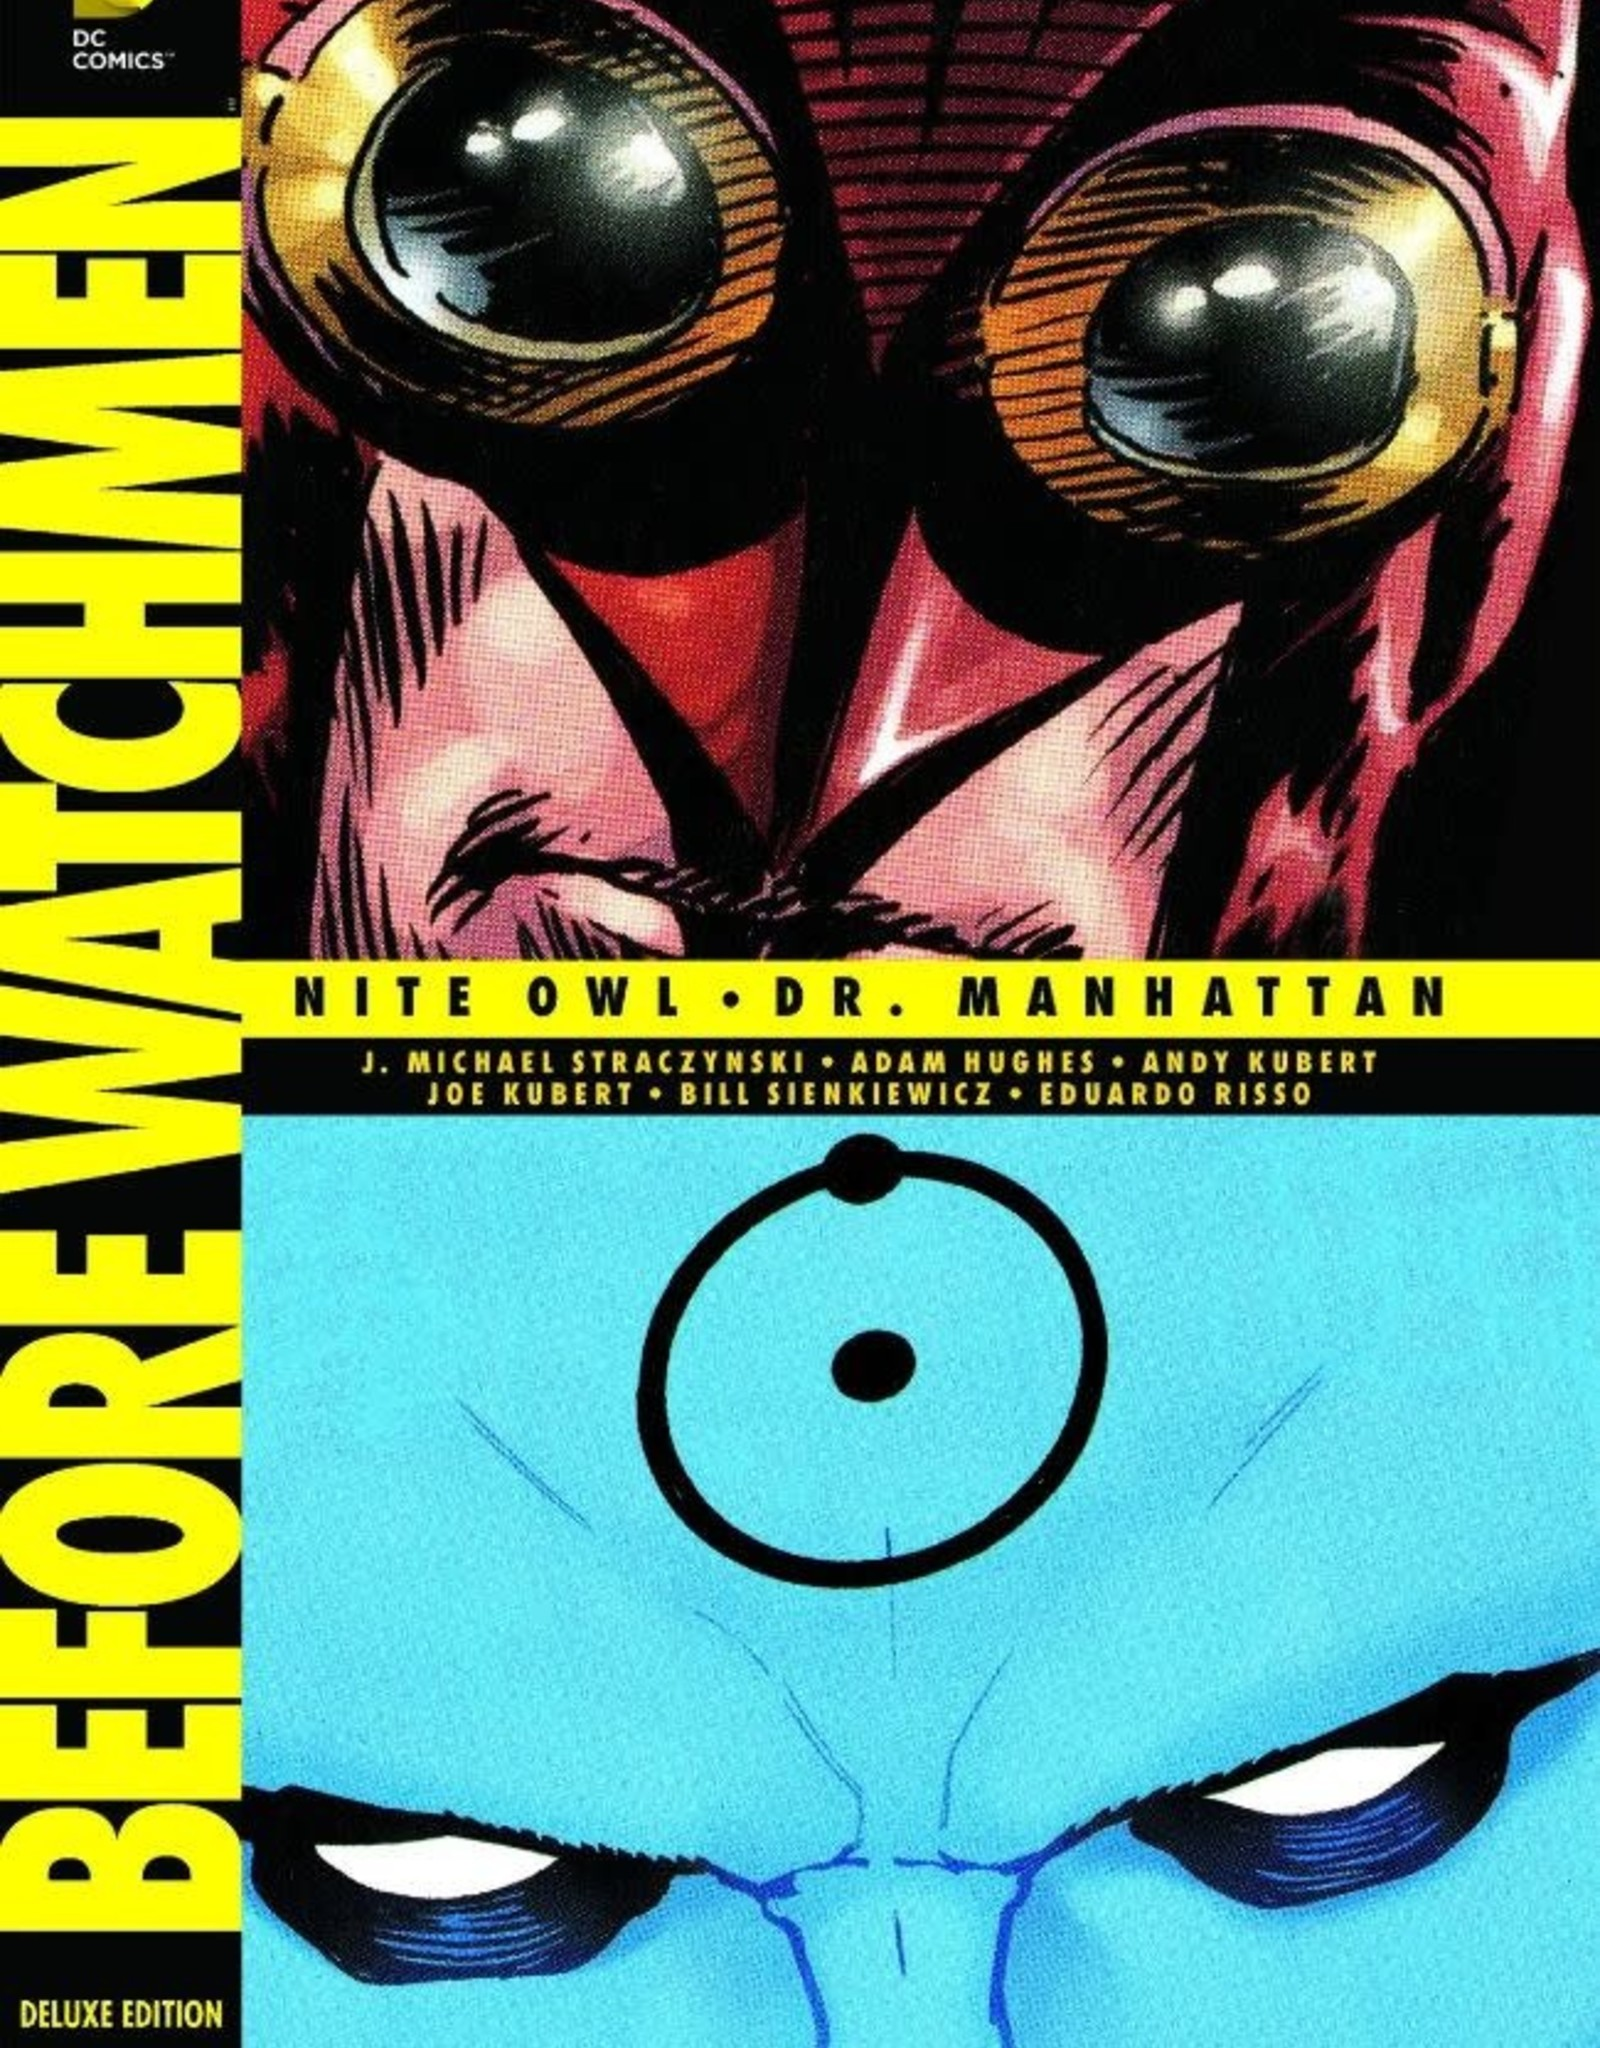 DC Comics Before Watchmen Nite Owl-Dr. Manhattan